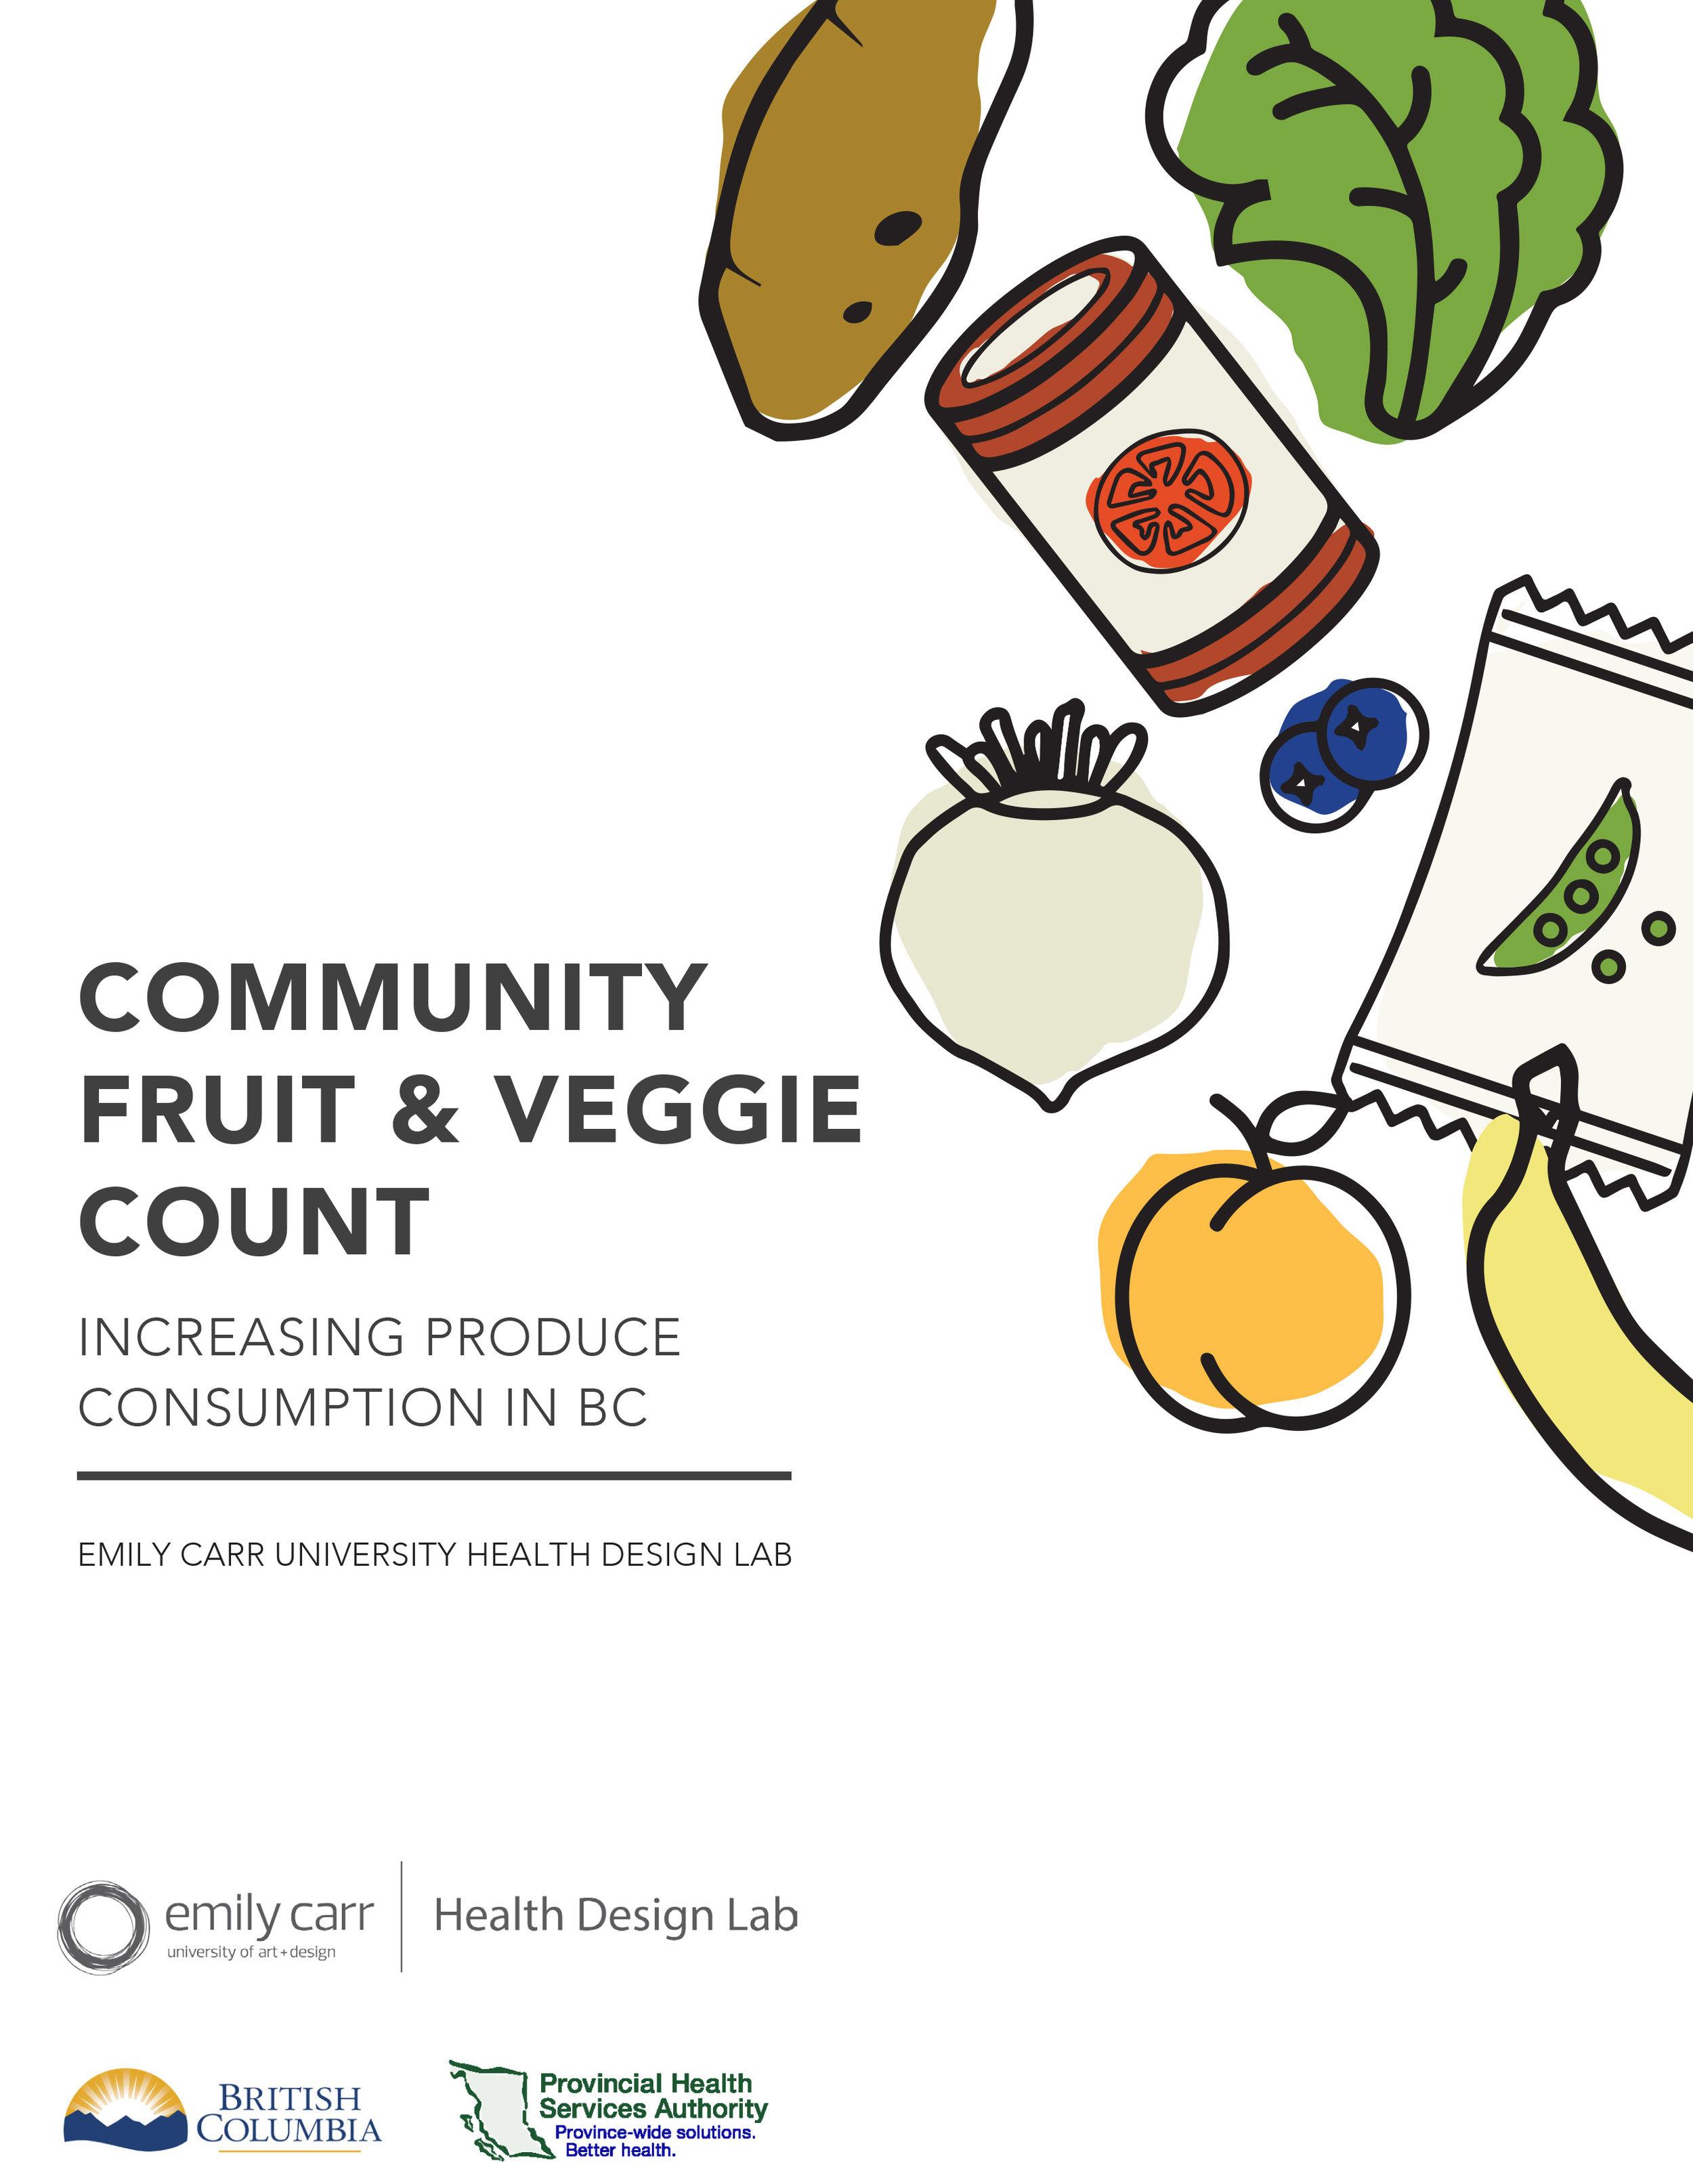 COMMUNITY FRUIT AND VEGGIE COUNT